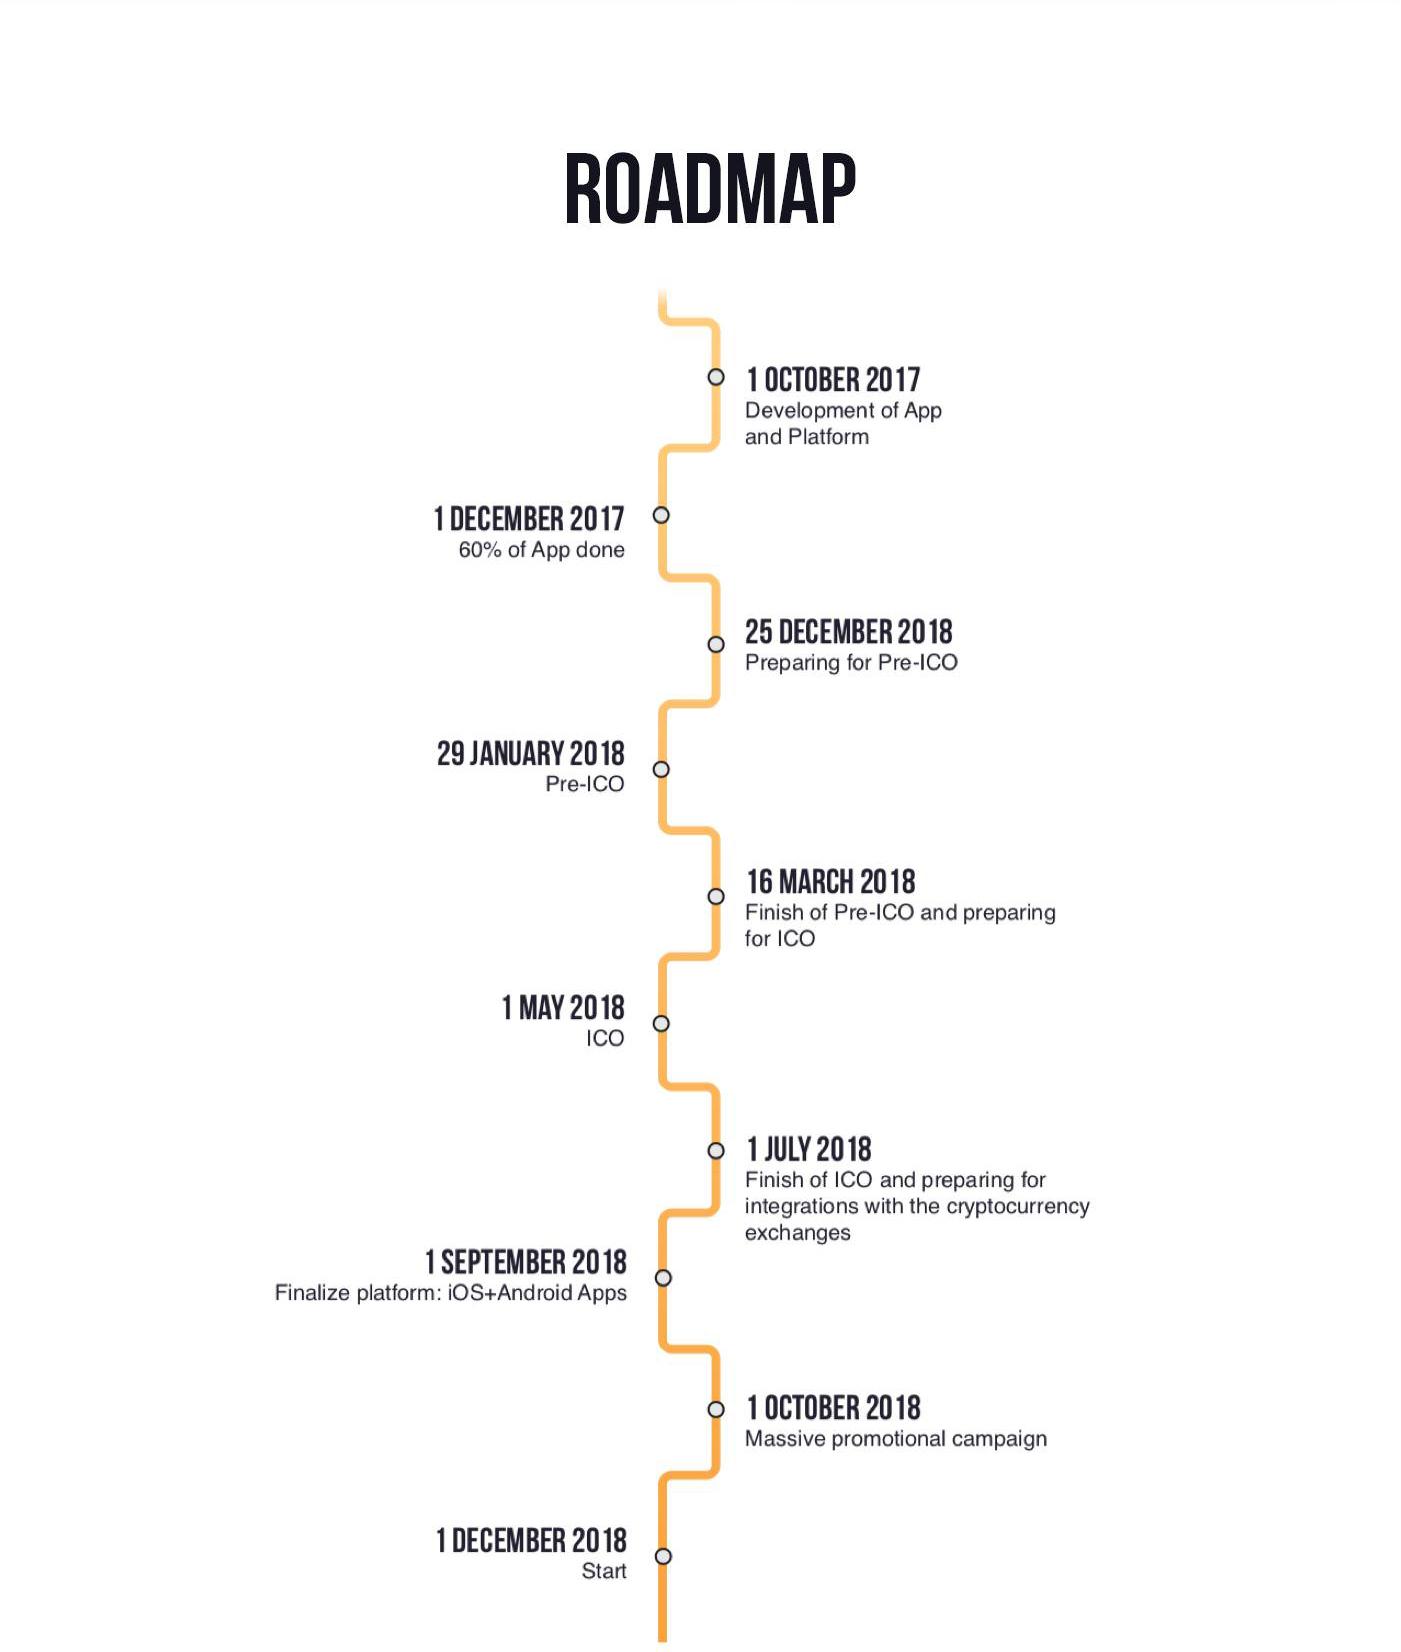 Hero.org Roadmap, HeroApp, Tokenize yourself